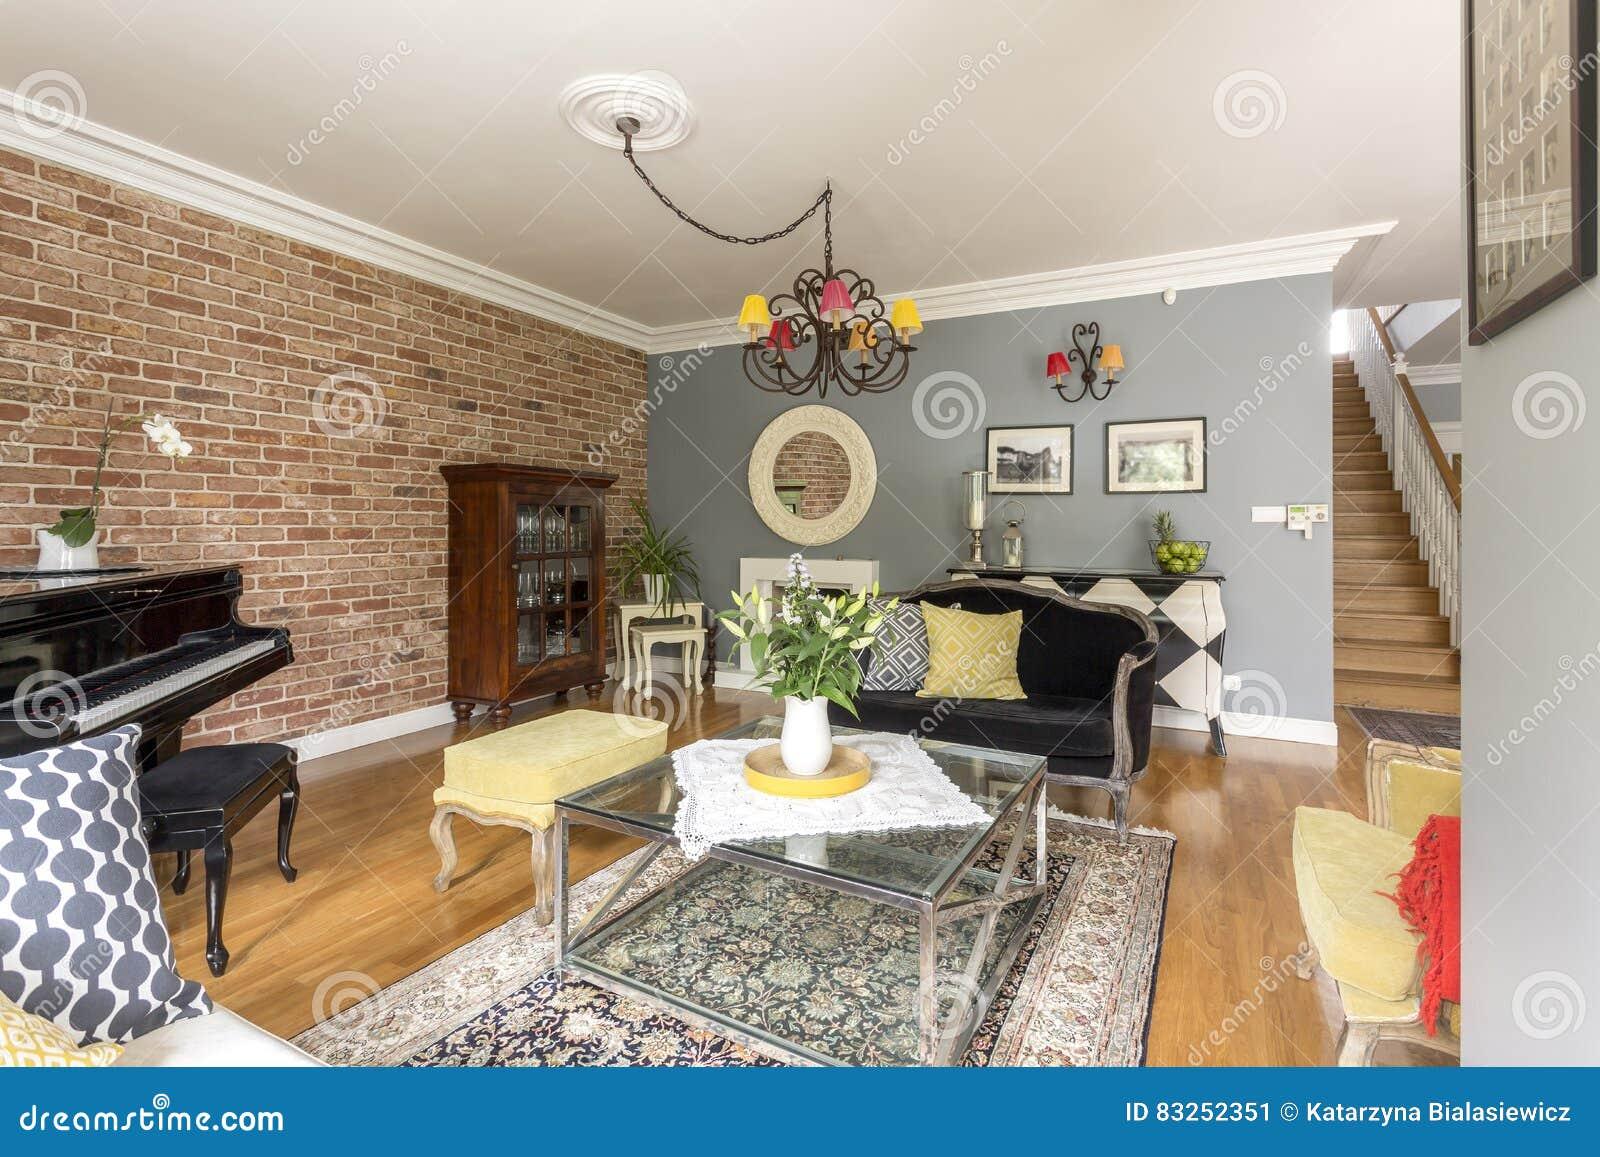 Stunning rustieke woonkamer photos ideeën voor thuis ibarakijets.org